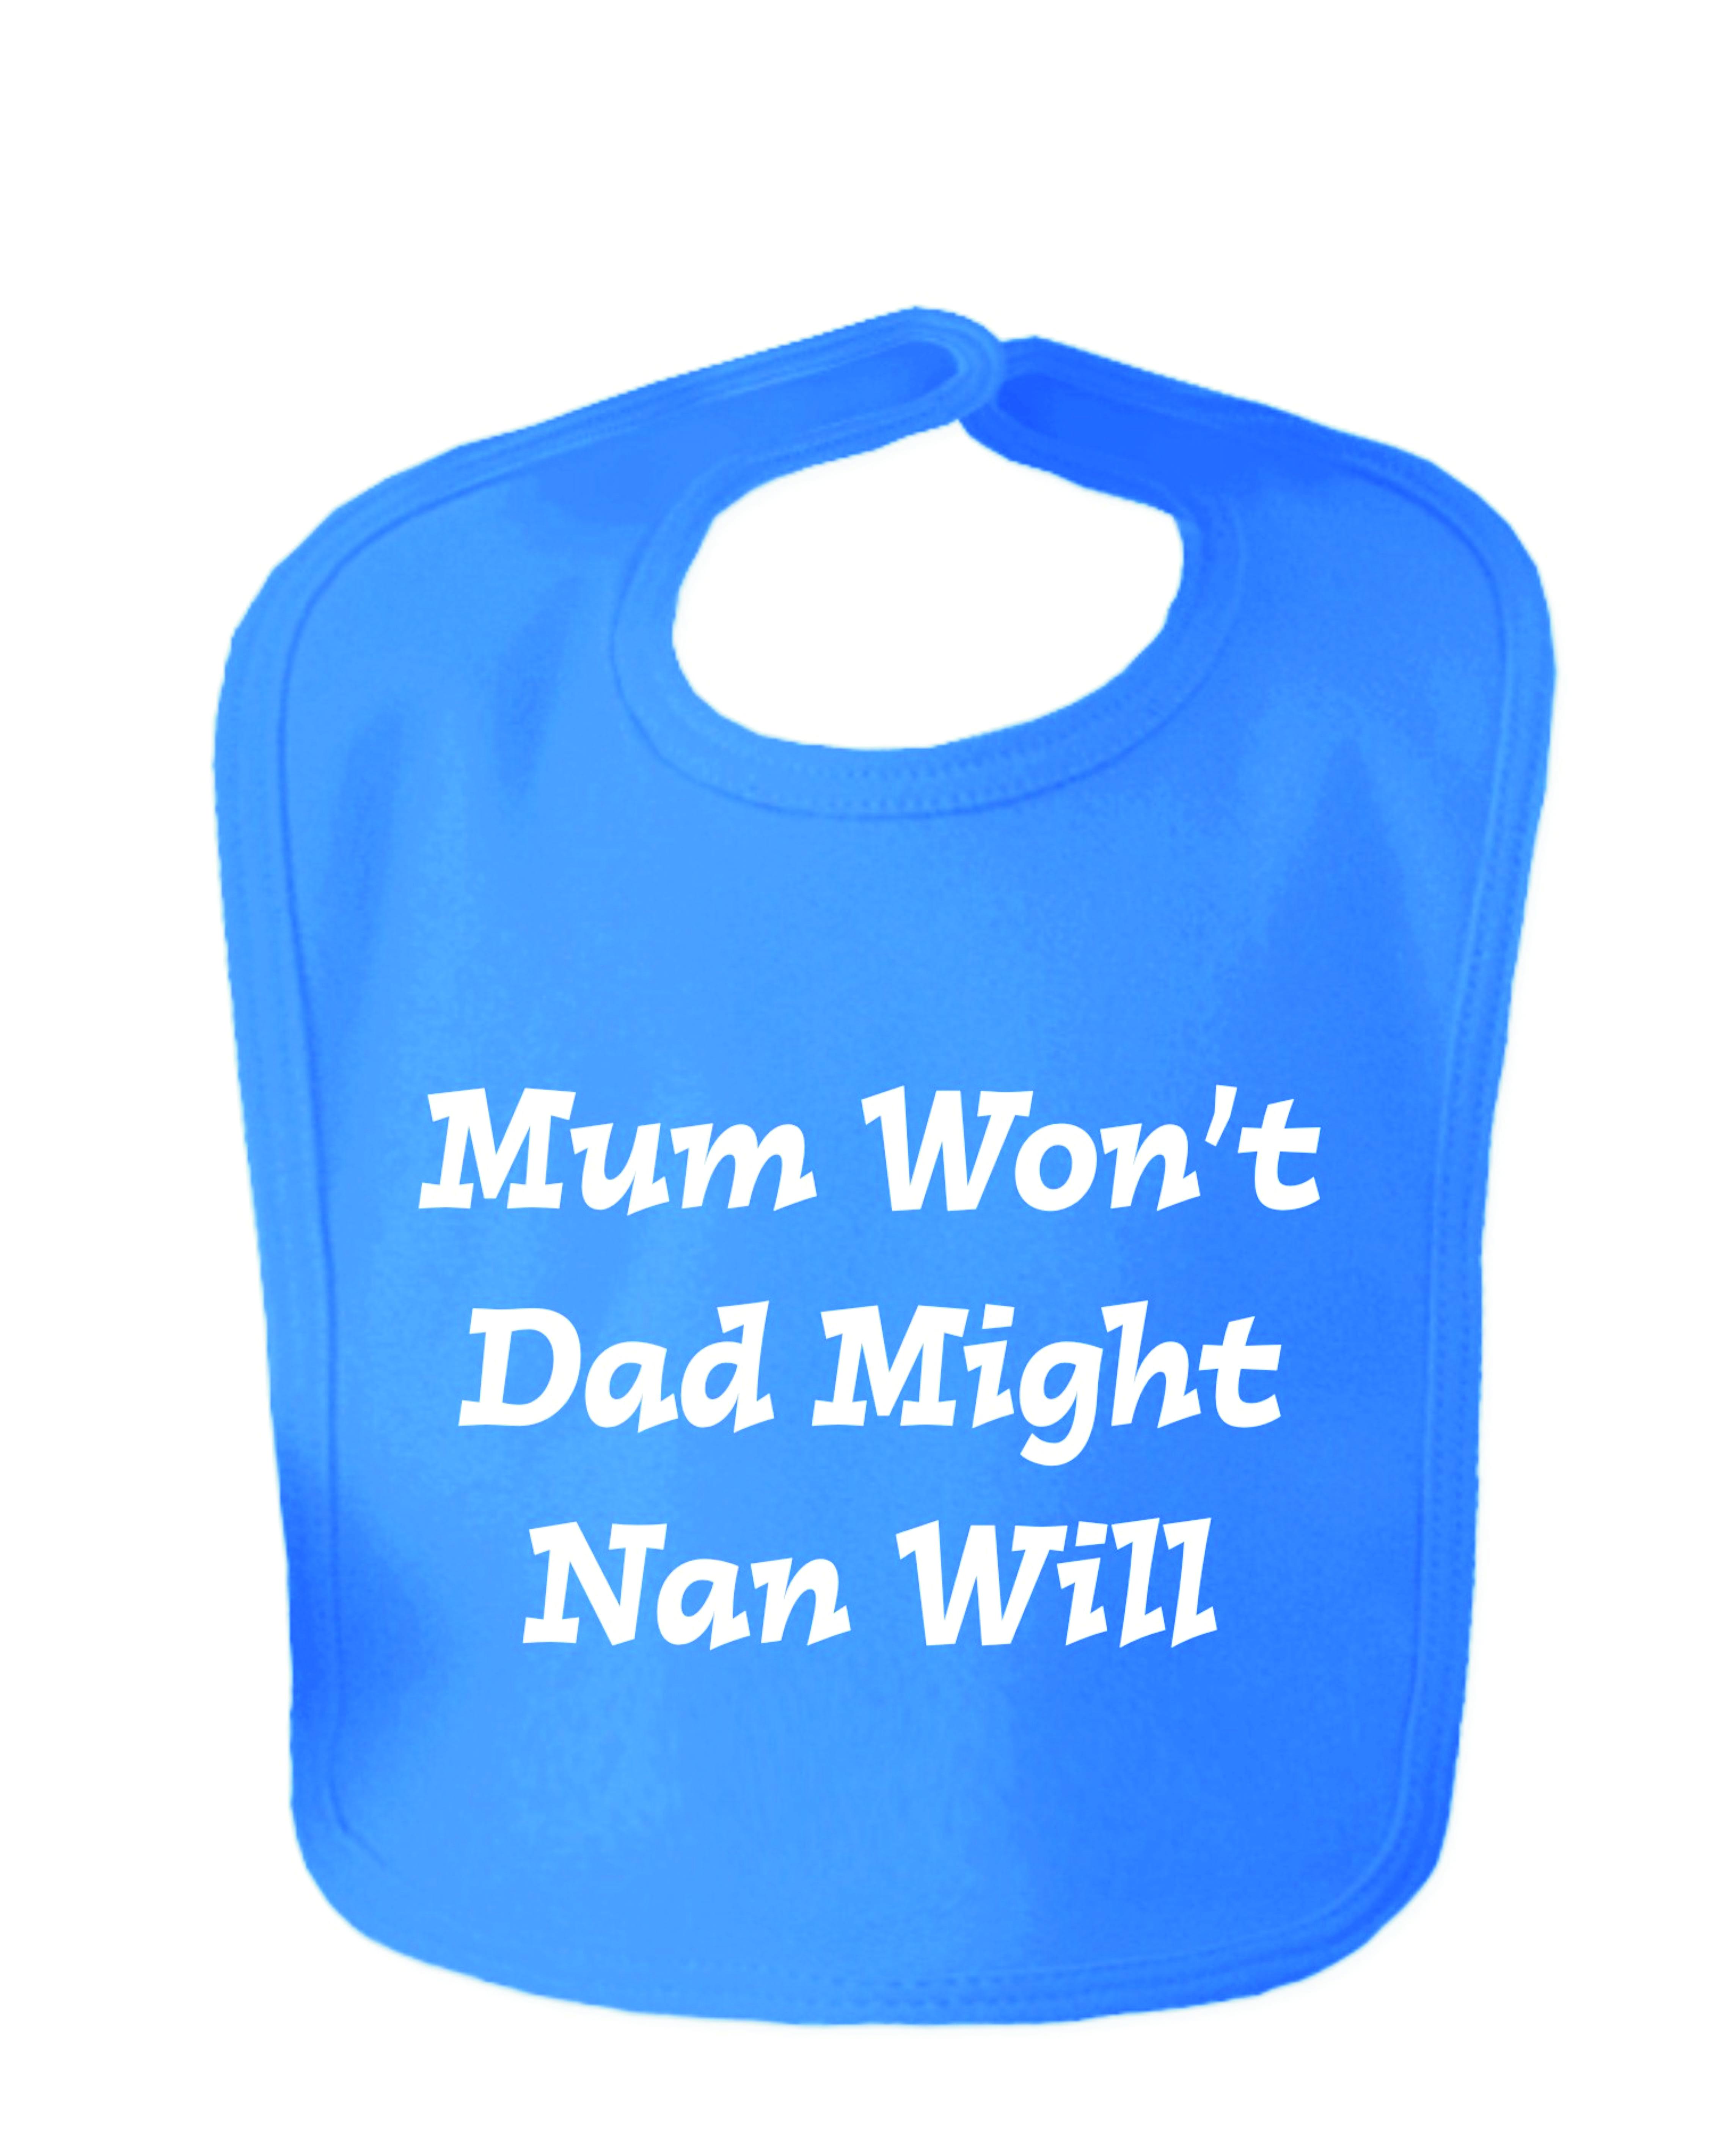 Royal Blue Mum Won't Dad Might Nan Will Velcro Baby Bib